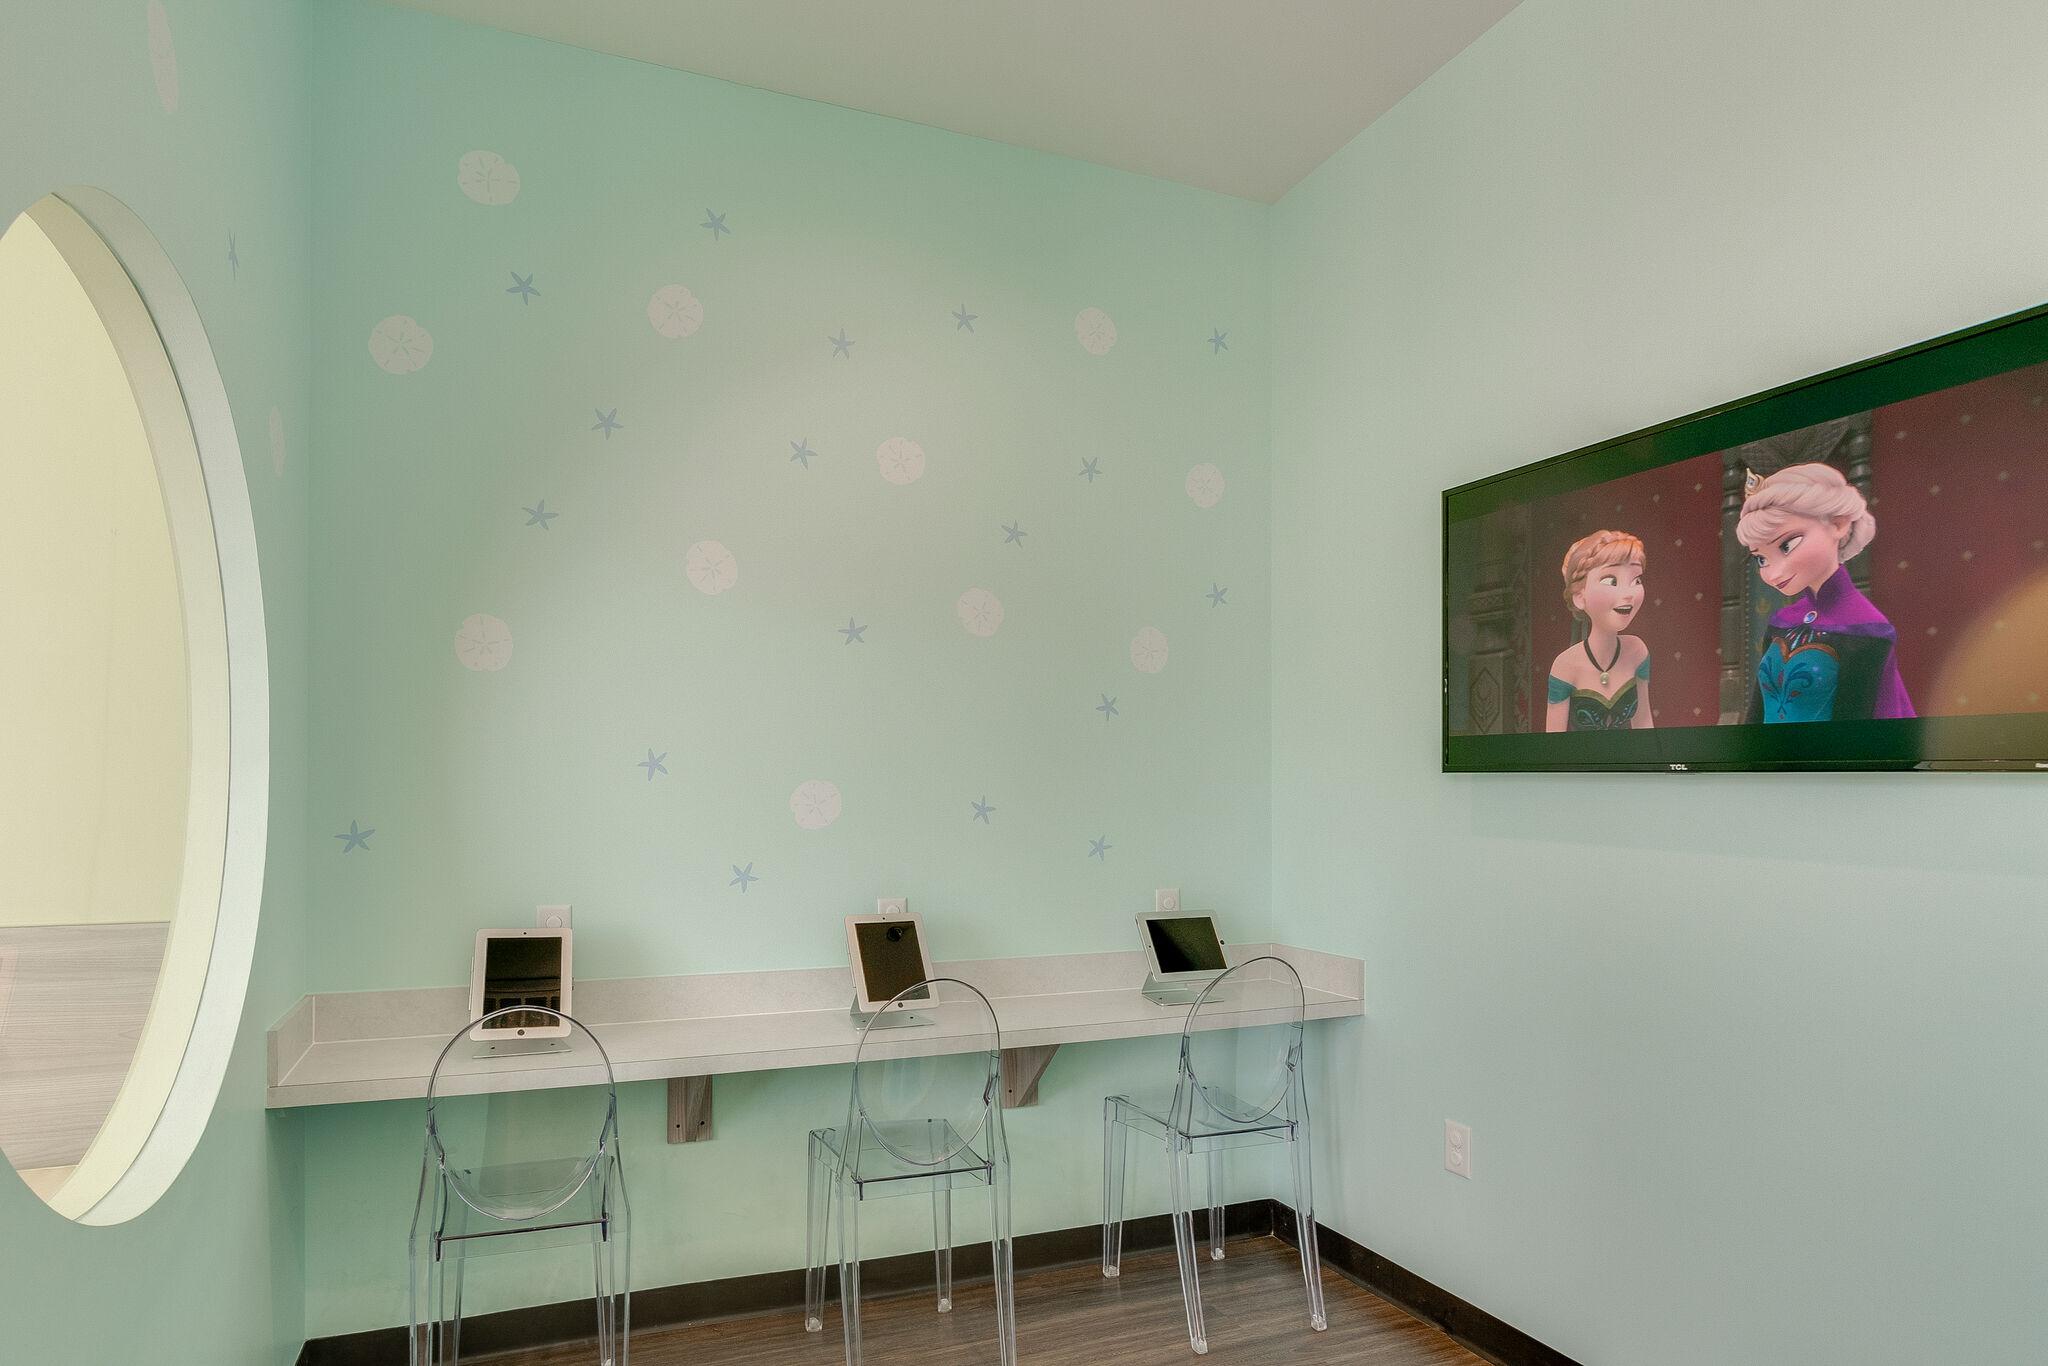 Kid's Area of Hurst Pediatric Dentistry Office